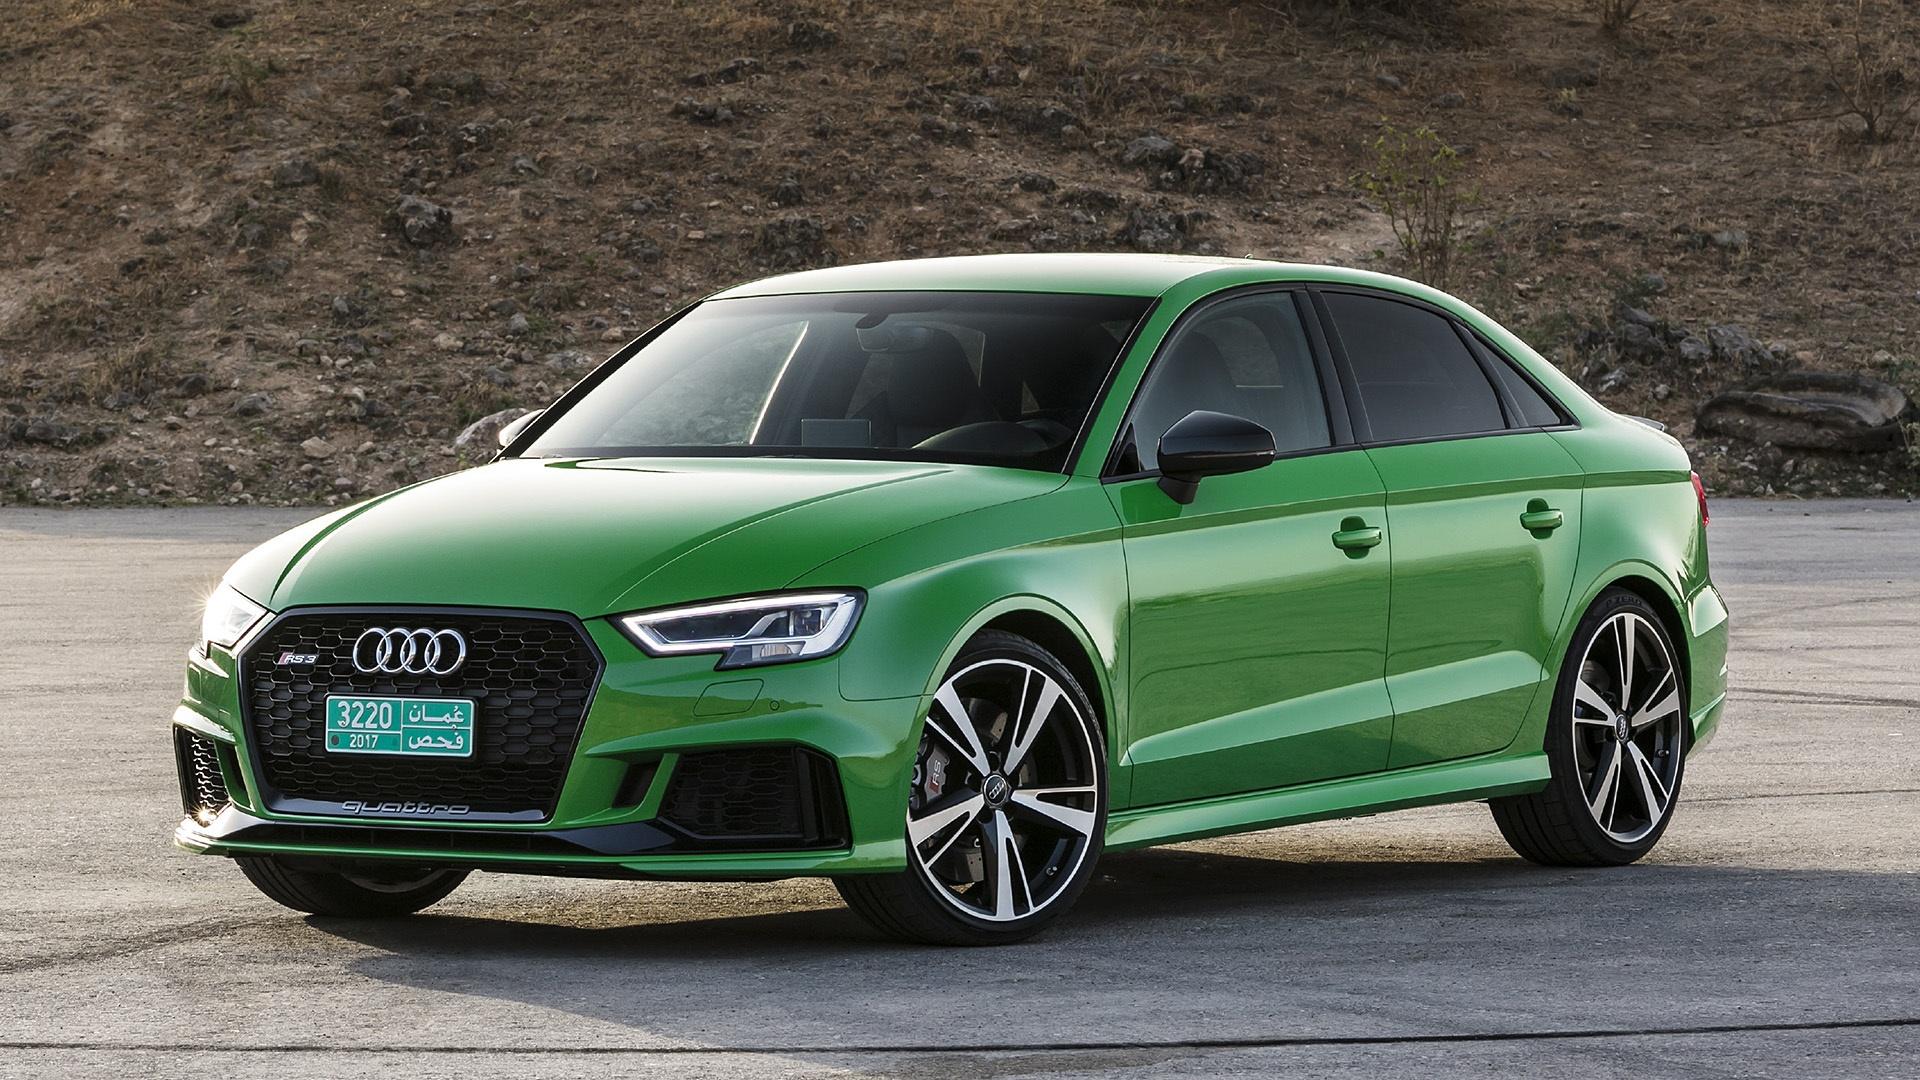 2017 Audi Rs3 Sedan Green Wallpaper 1920x1080 1083307